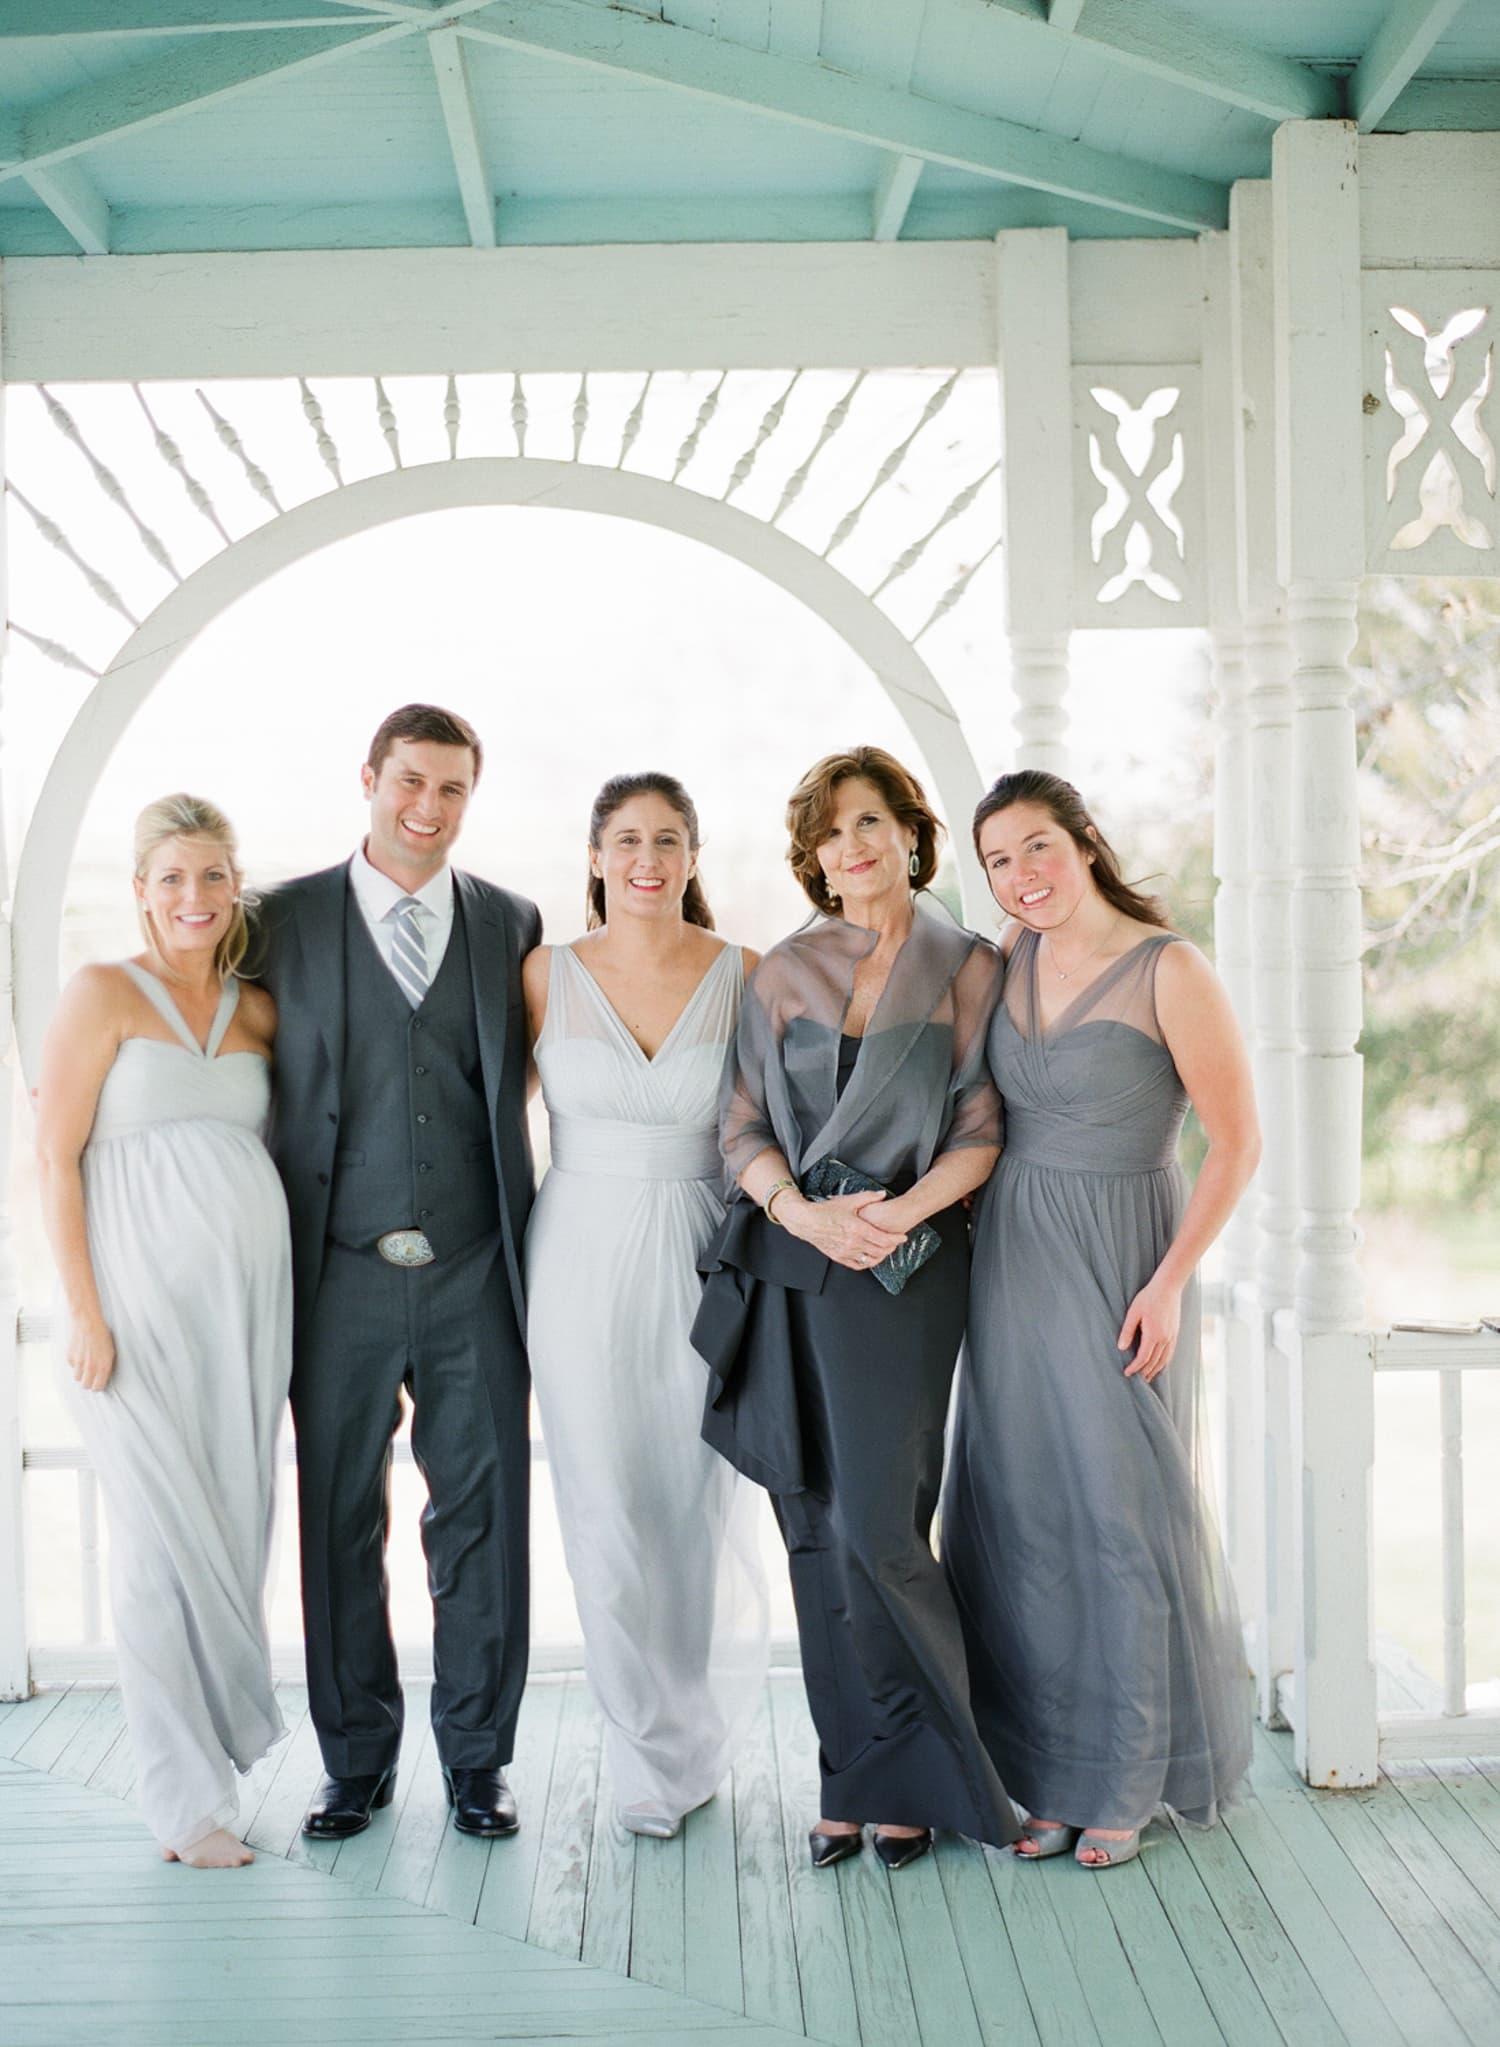 barr-mansion-wedding-12.jpg